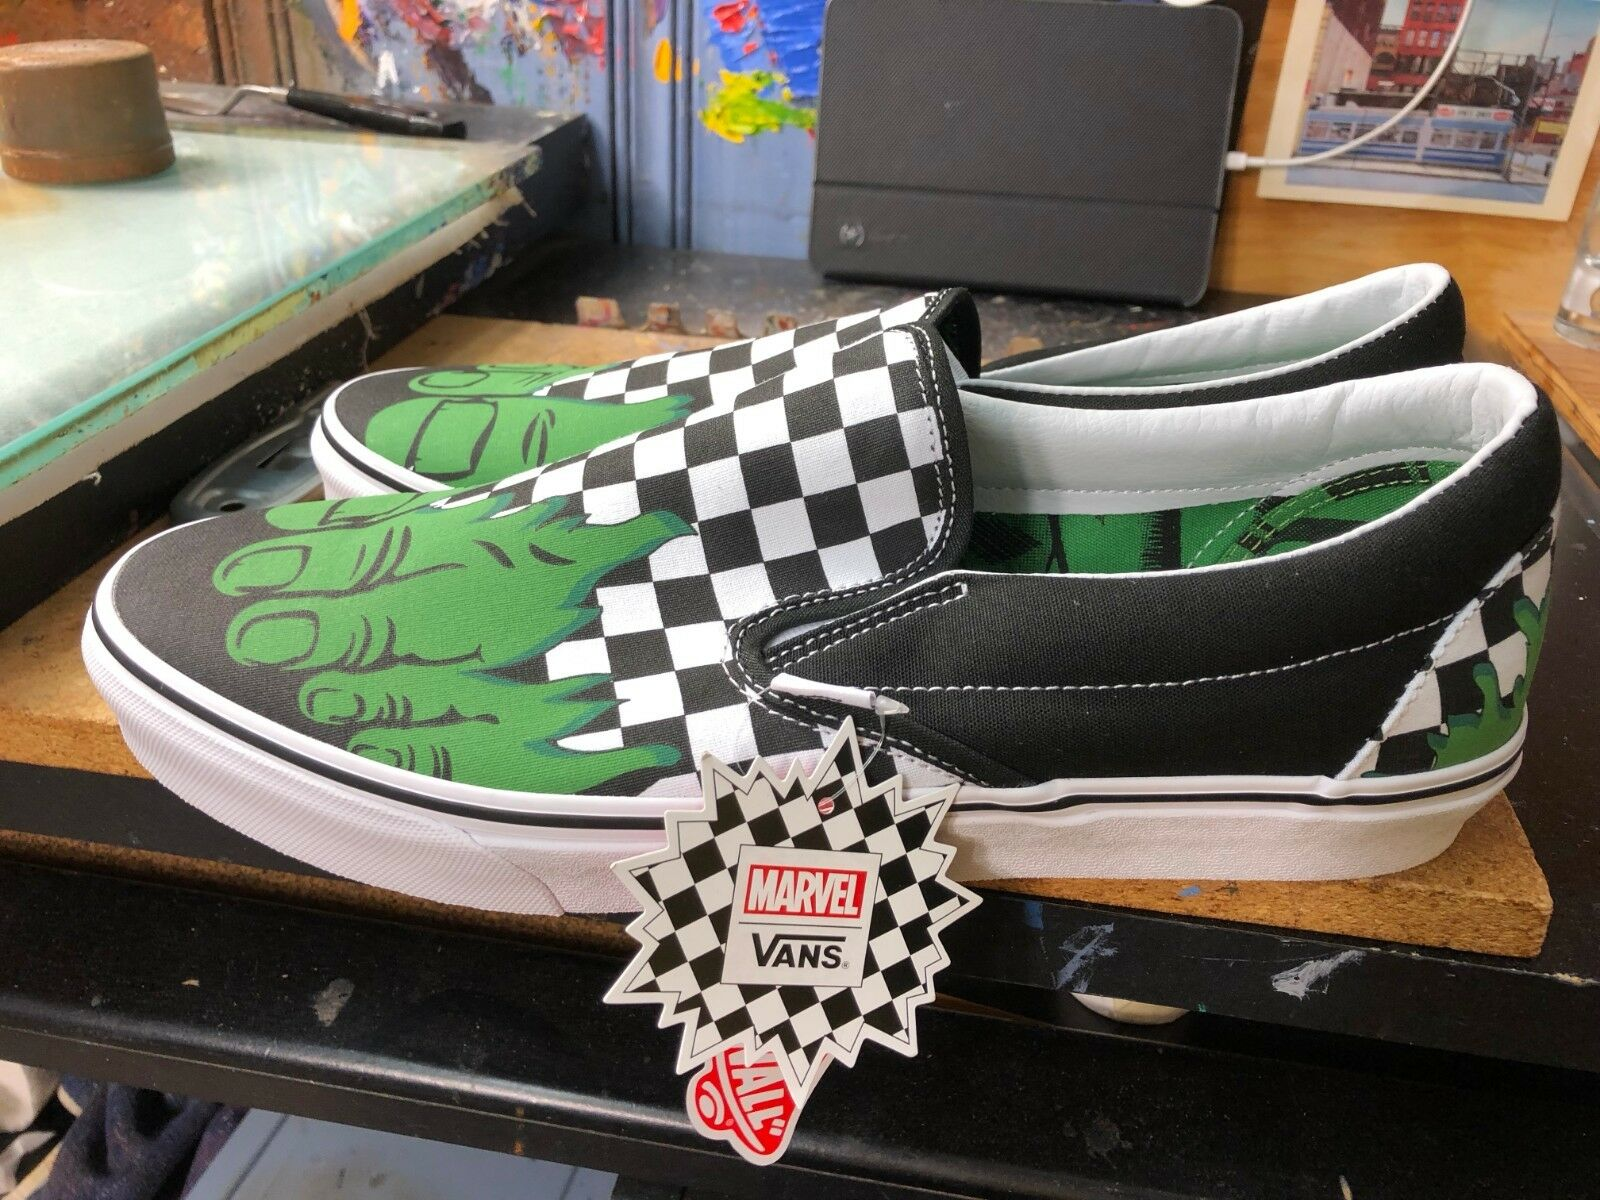 Vans Classic Slip-On (Marvel) Hulk Checkerboard  Size US 11 Men's VN0A38F7U44